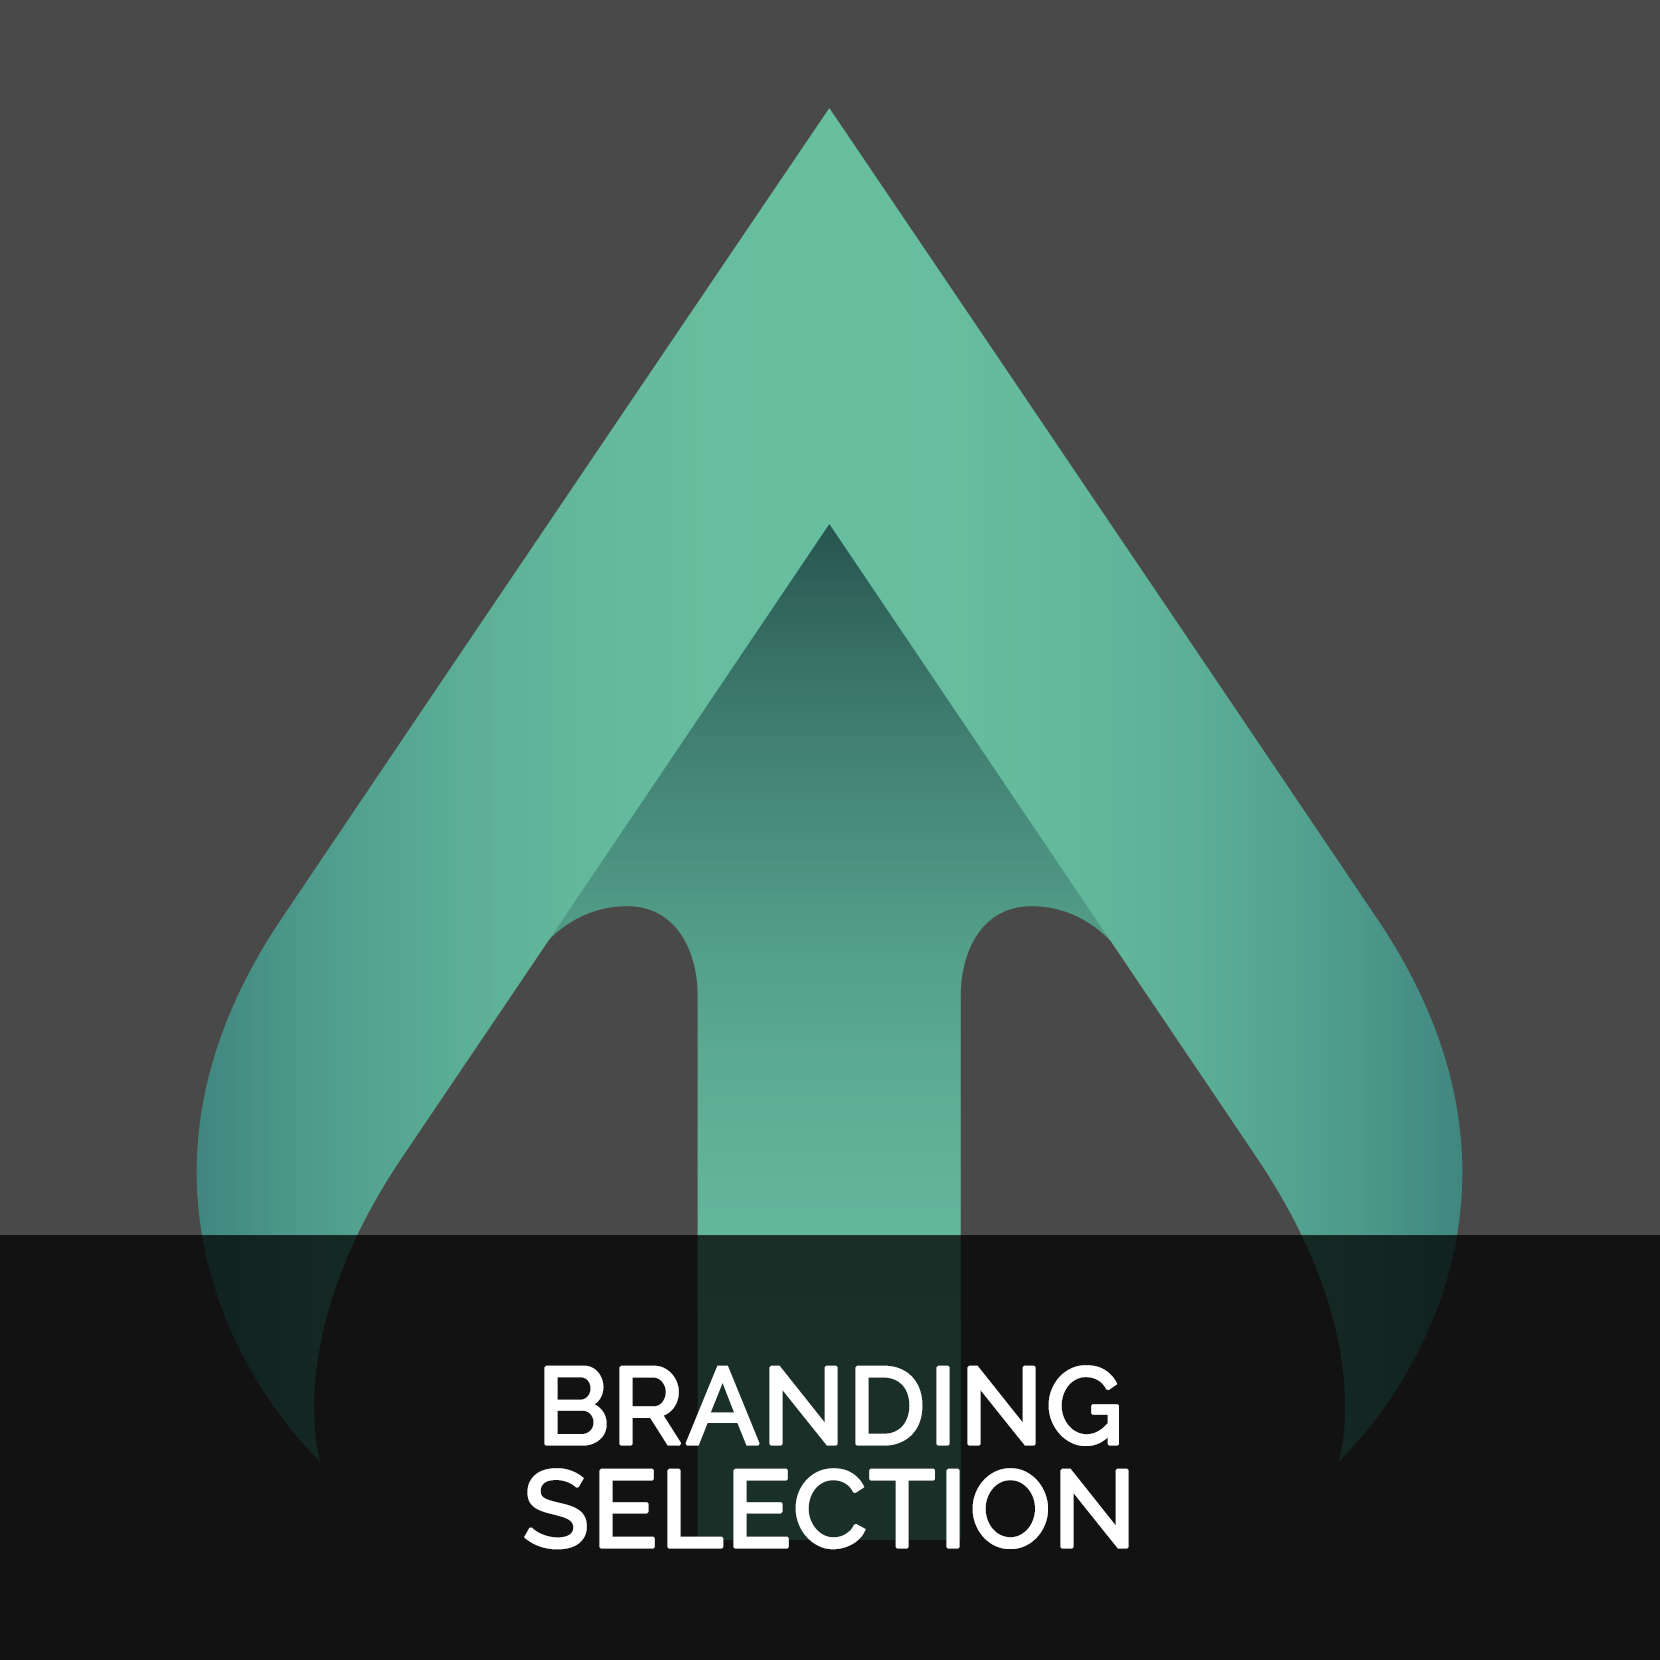 http://rusyndesign.co.uk/wp-content/uploads/2015/04/Work-square-Branding.jpg